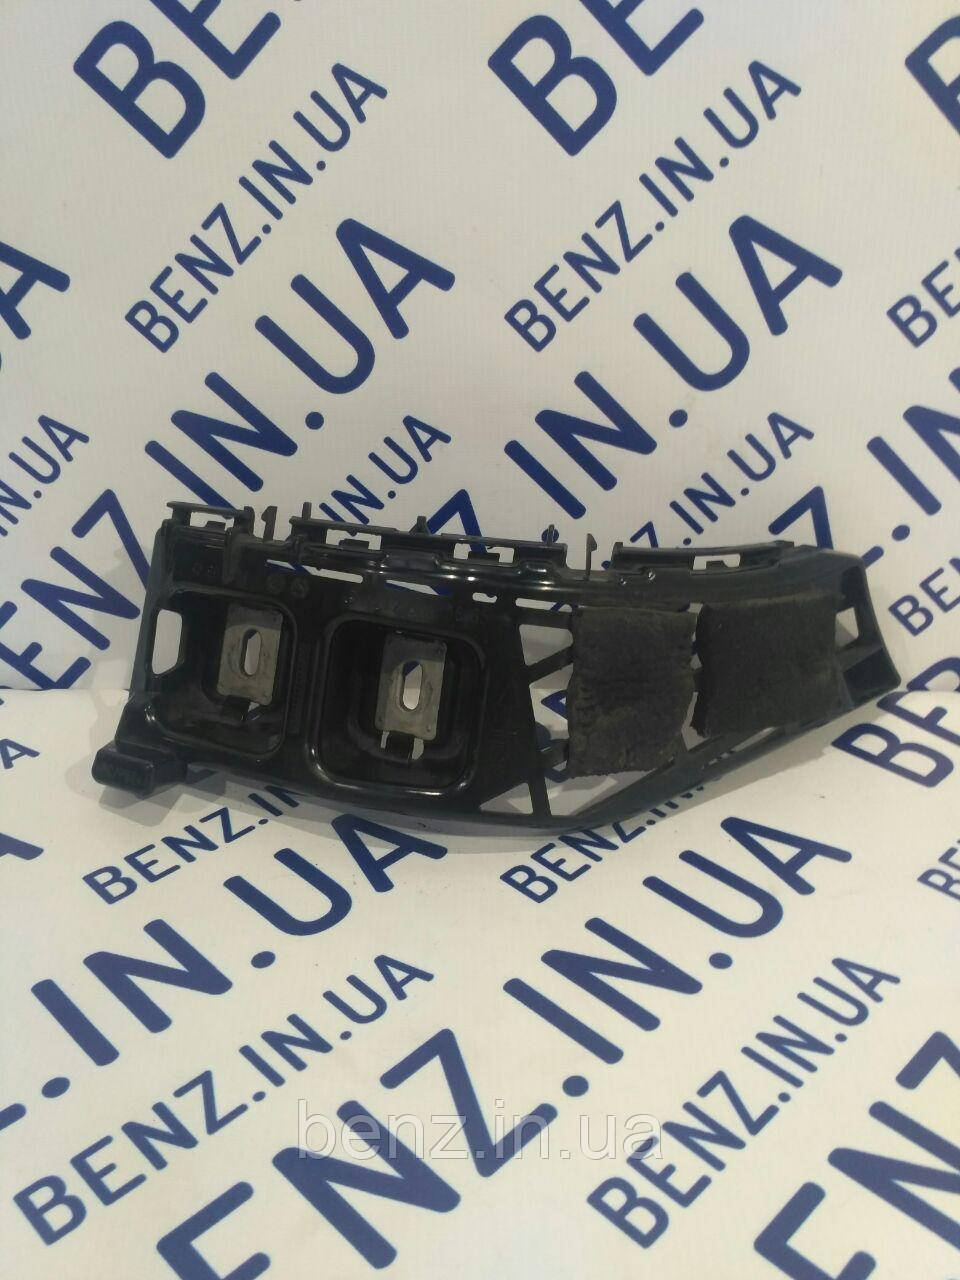 Опорный кронштейн заднего бампера справа Mercedes S212 A2128853665